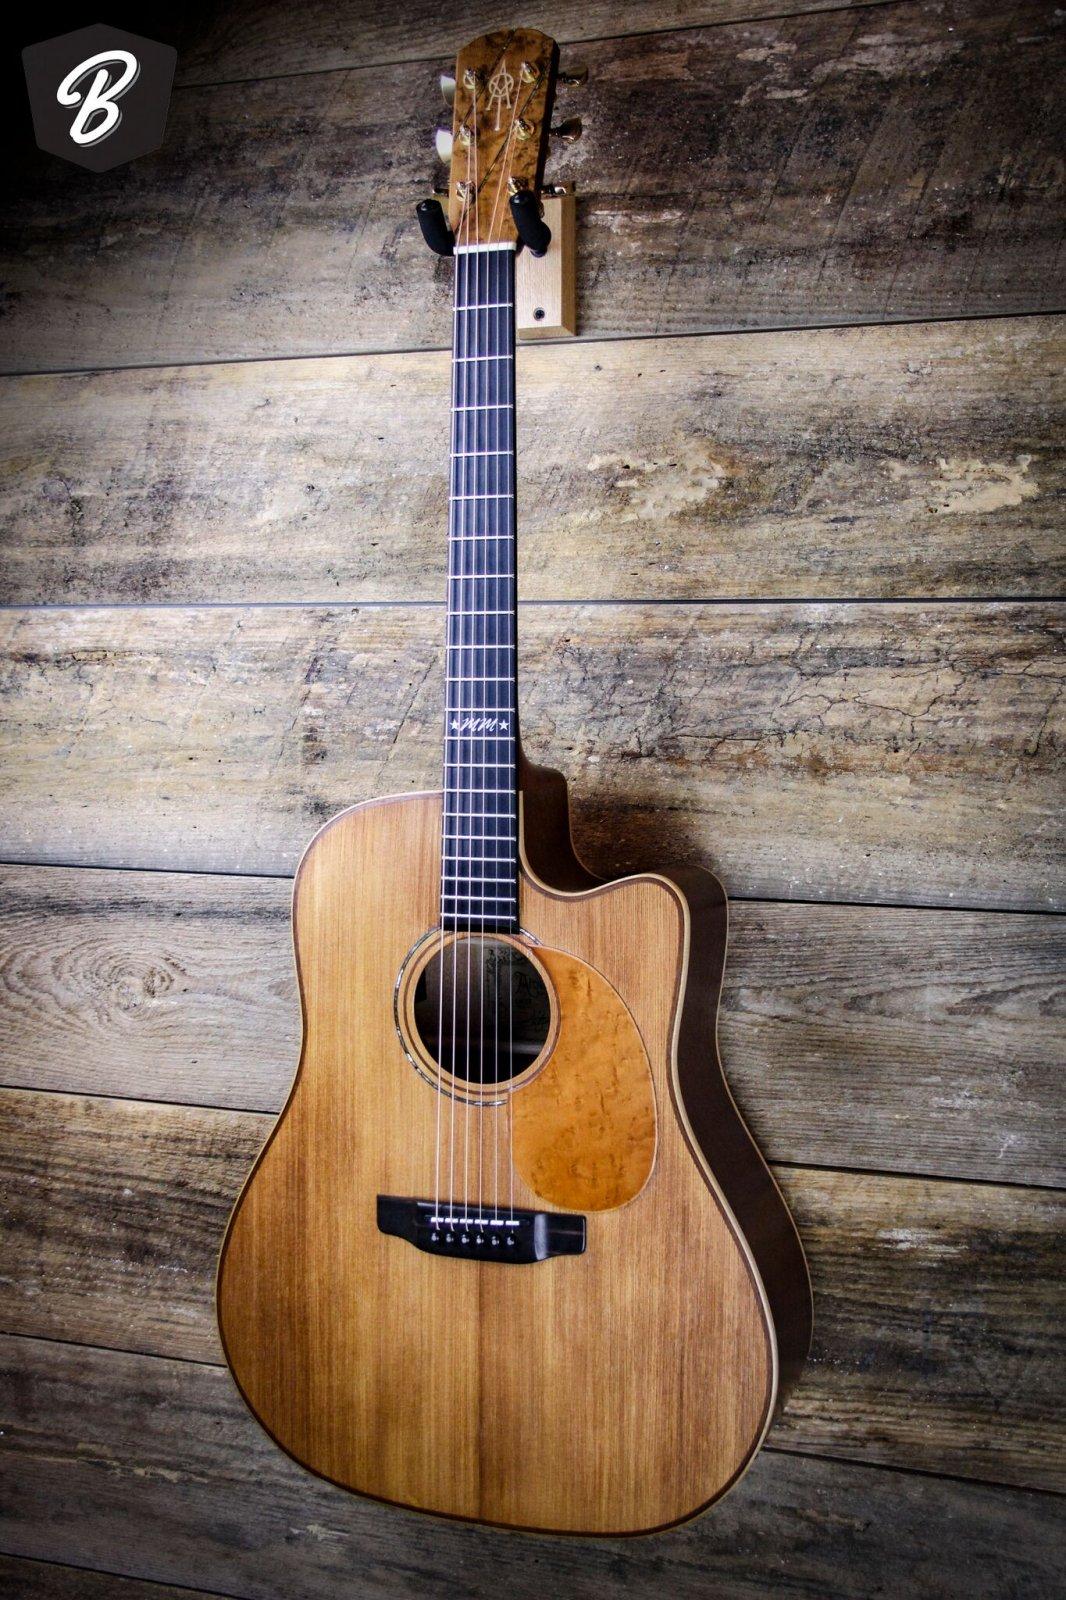 Alvarez Yairi MMY1 Monte Montgomery Acoustic Electric w/Case- 2005 Model